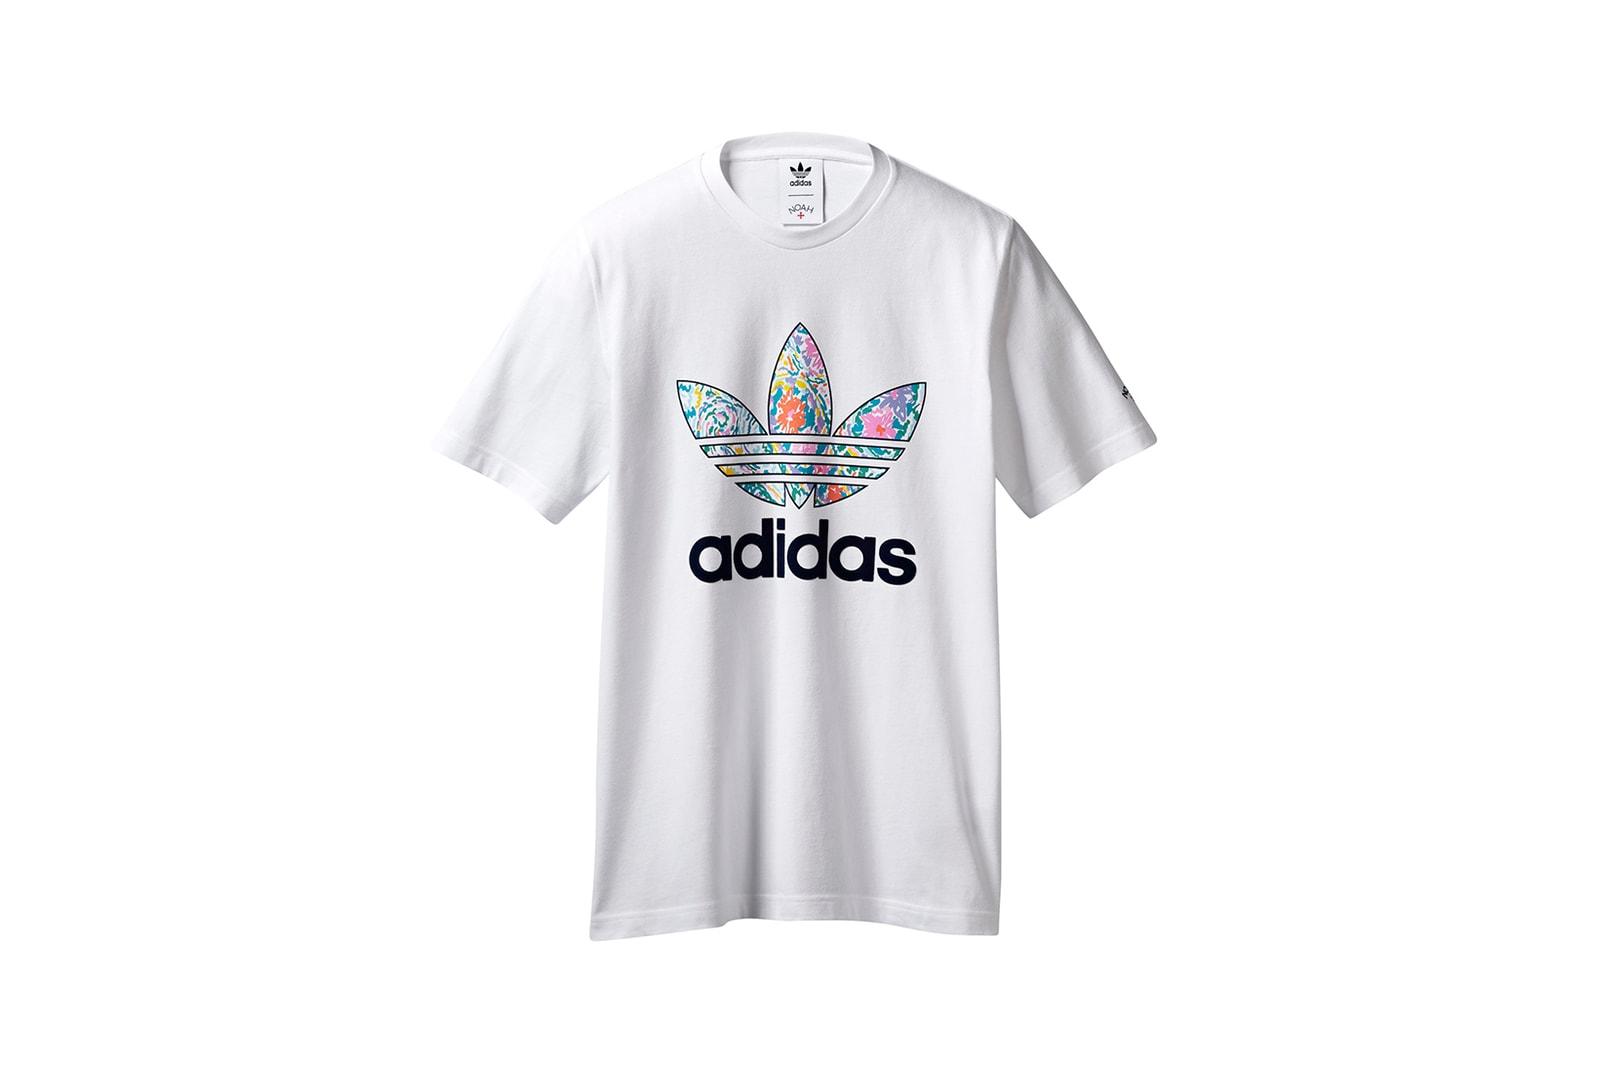 NOAH x adidas Originals Spring/Summer 2021 Collection Lookbook